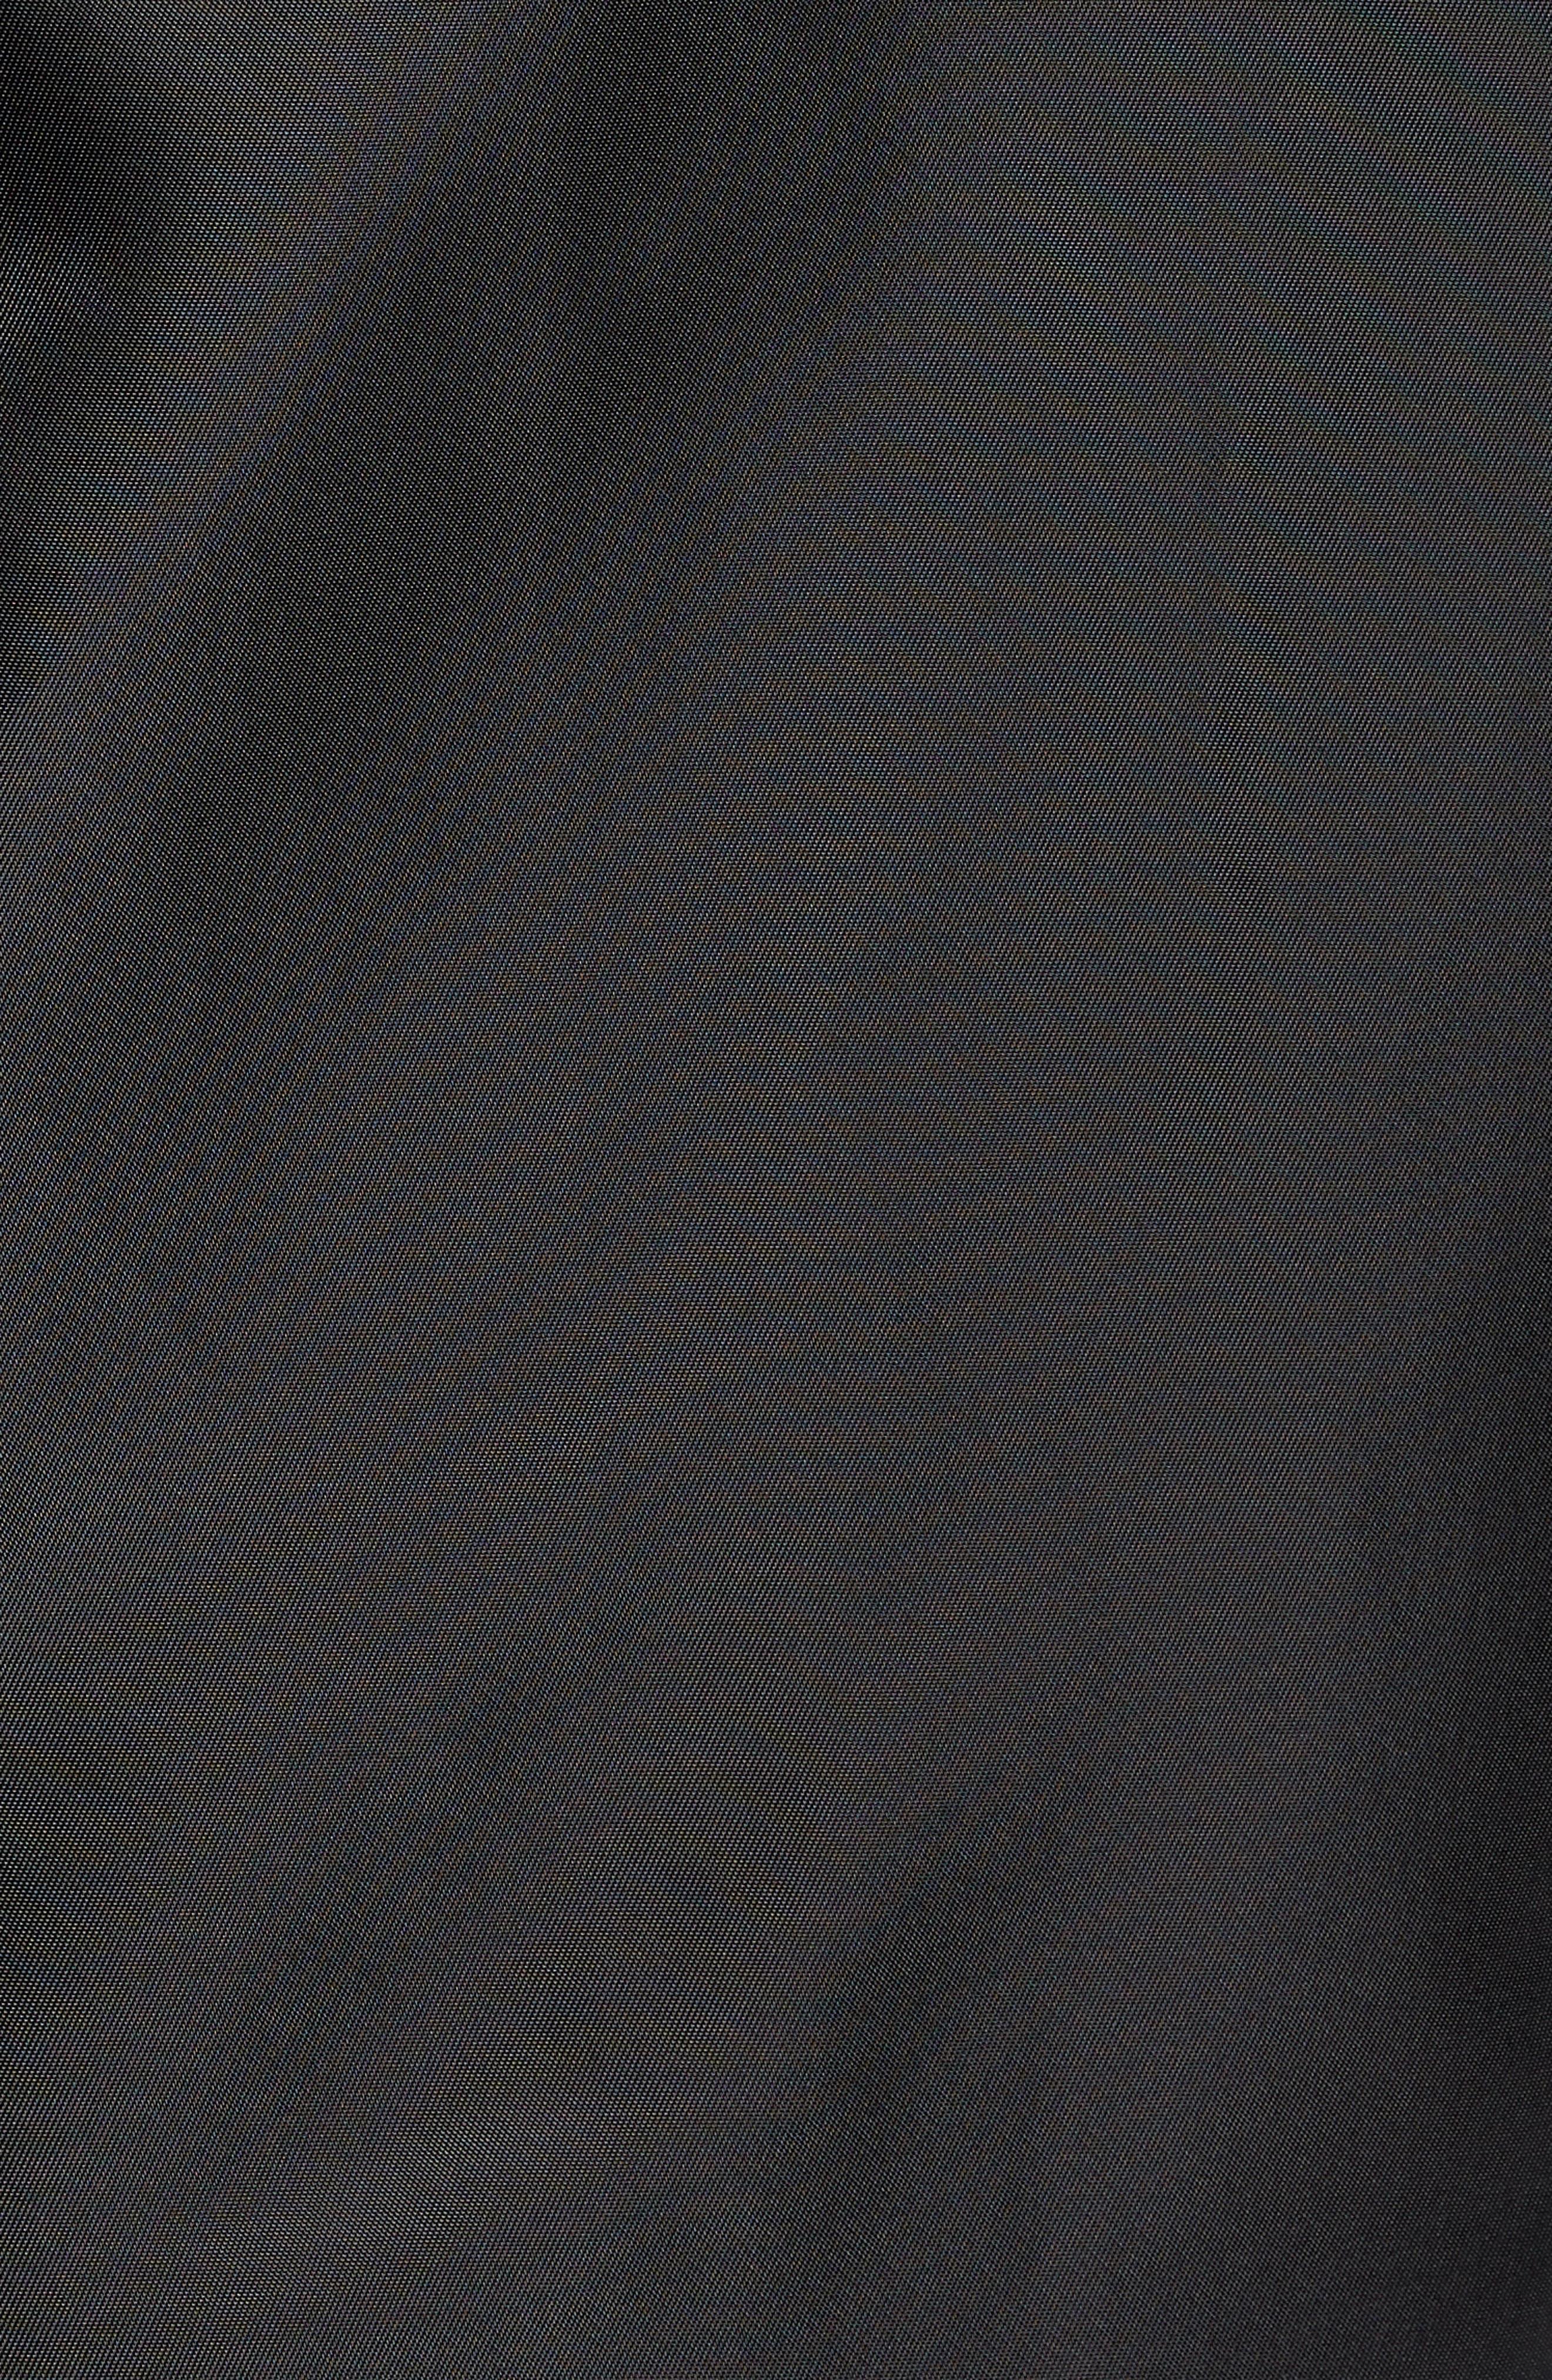 Fight Night Trim Fit Stadium Jacket,                             Alternate thumbnail 6, color,                             BLACK